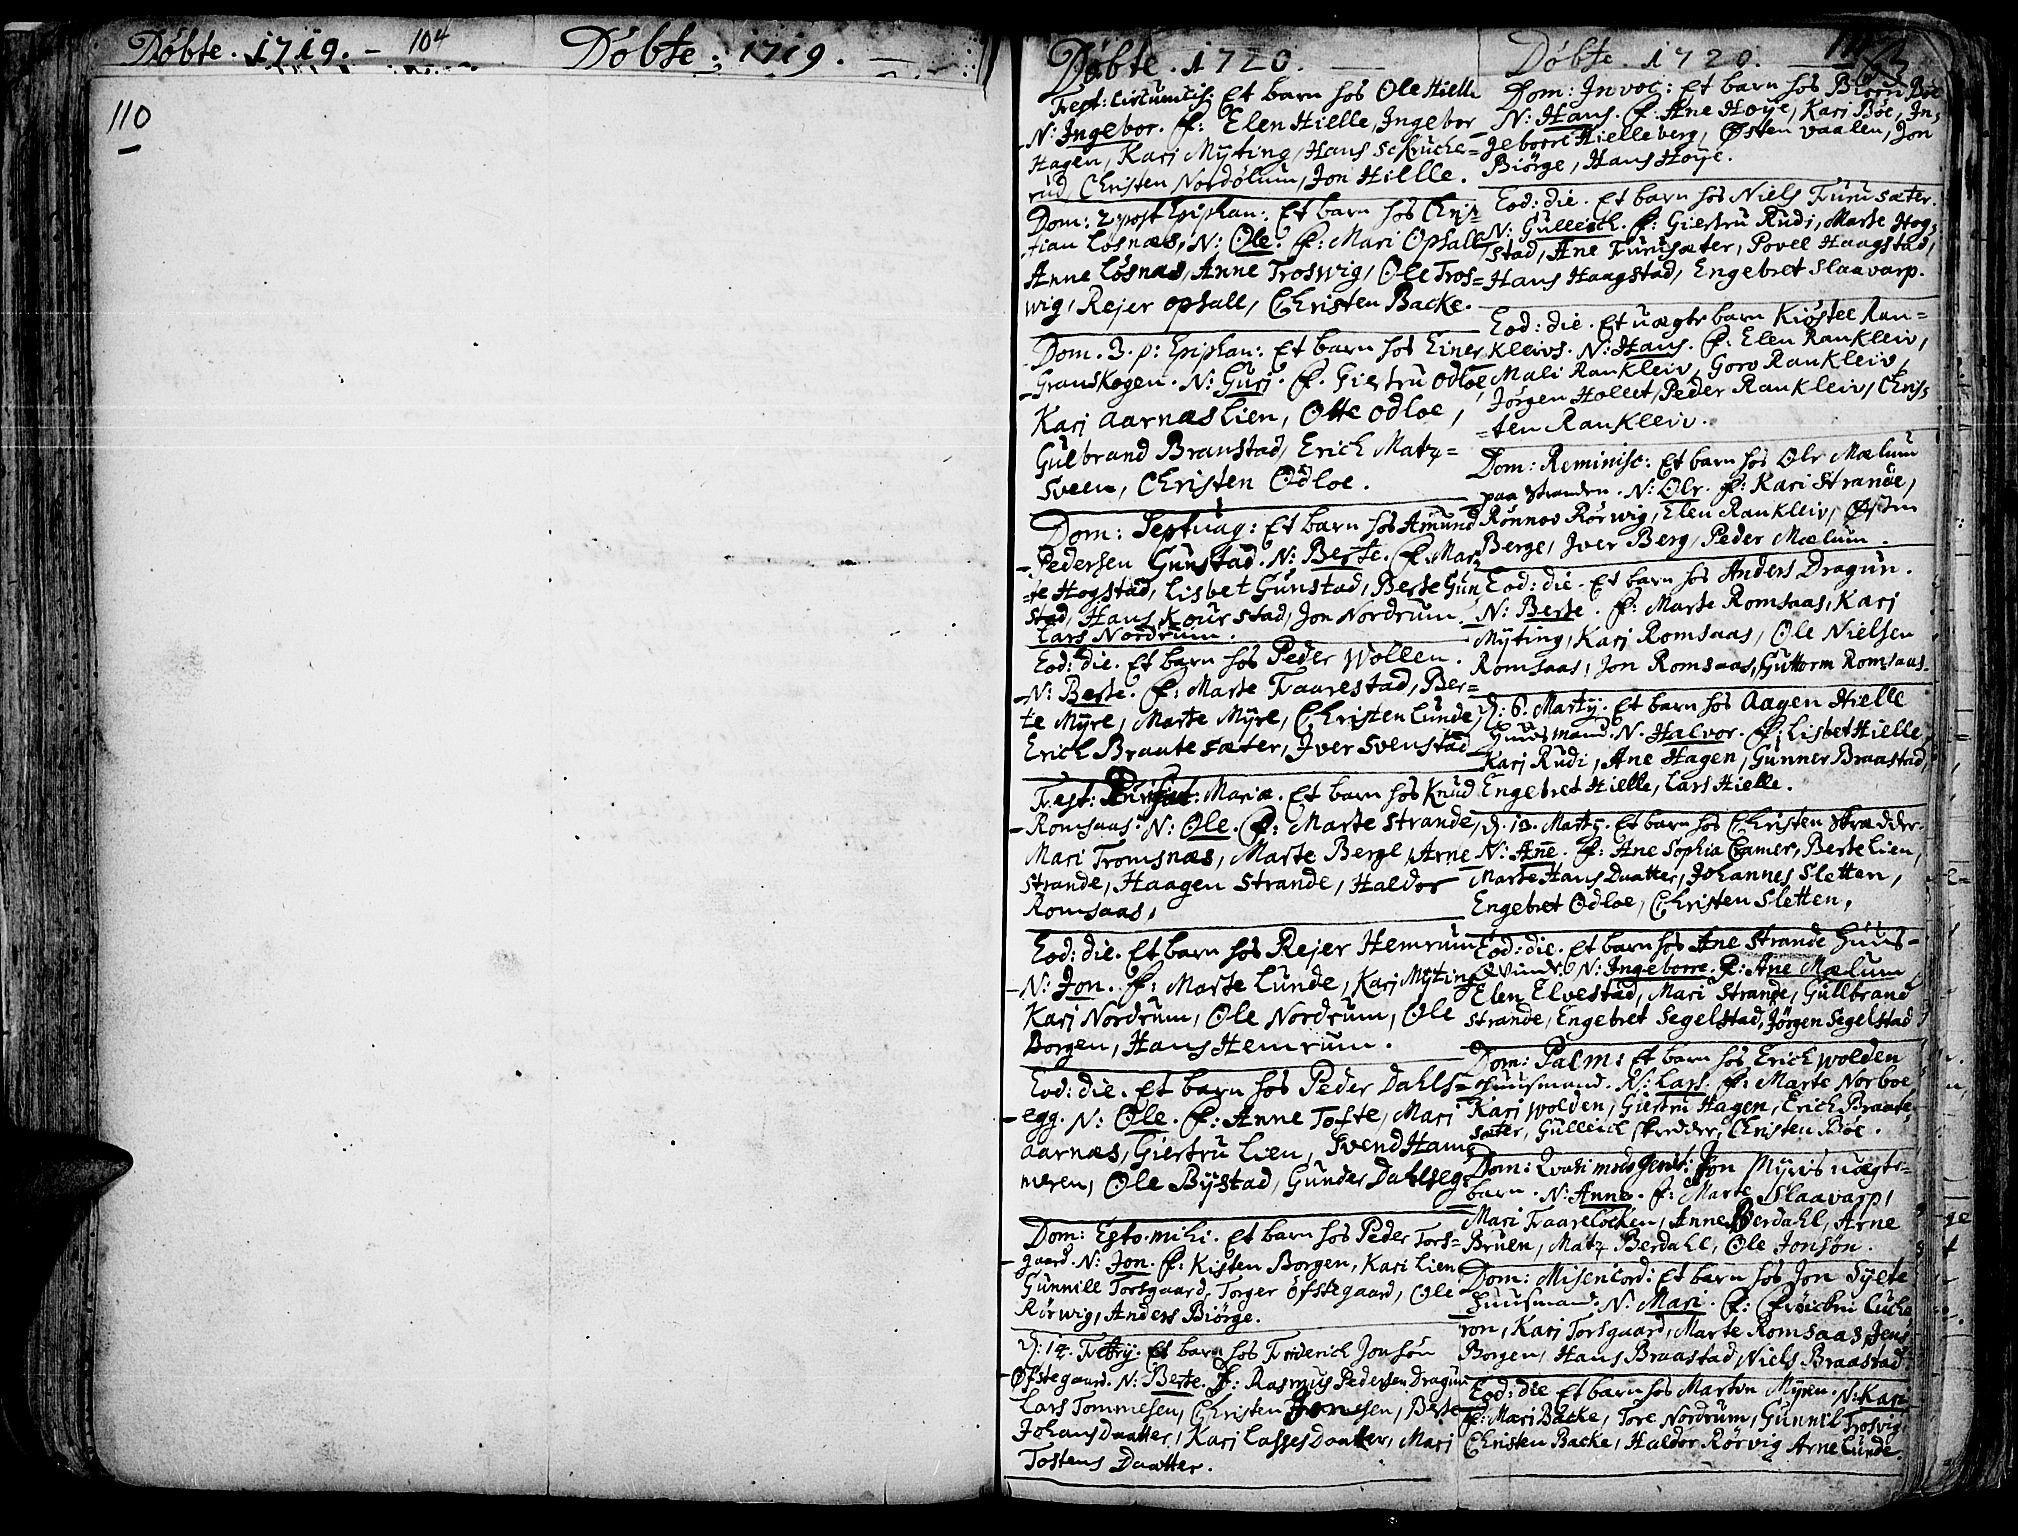 SAH, Ringebu prestekontor, Ministerialbok nr. 1, 1696-1733, s. 110-111